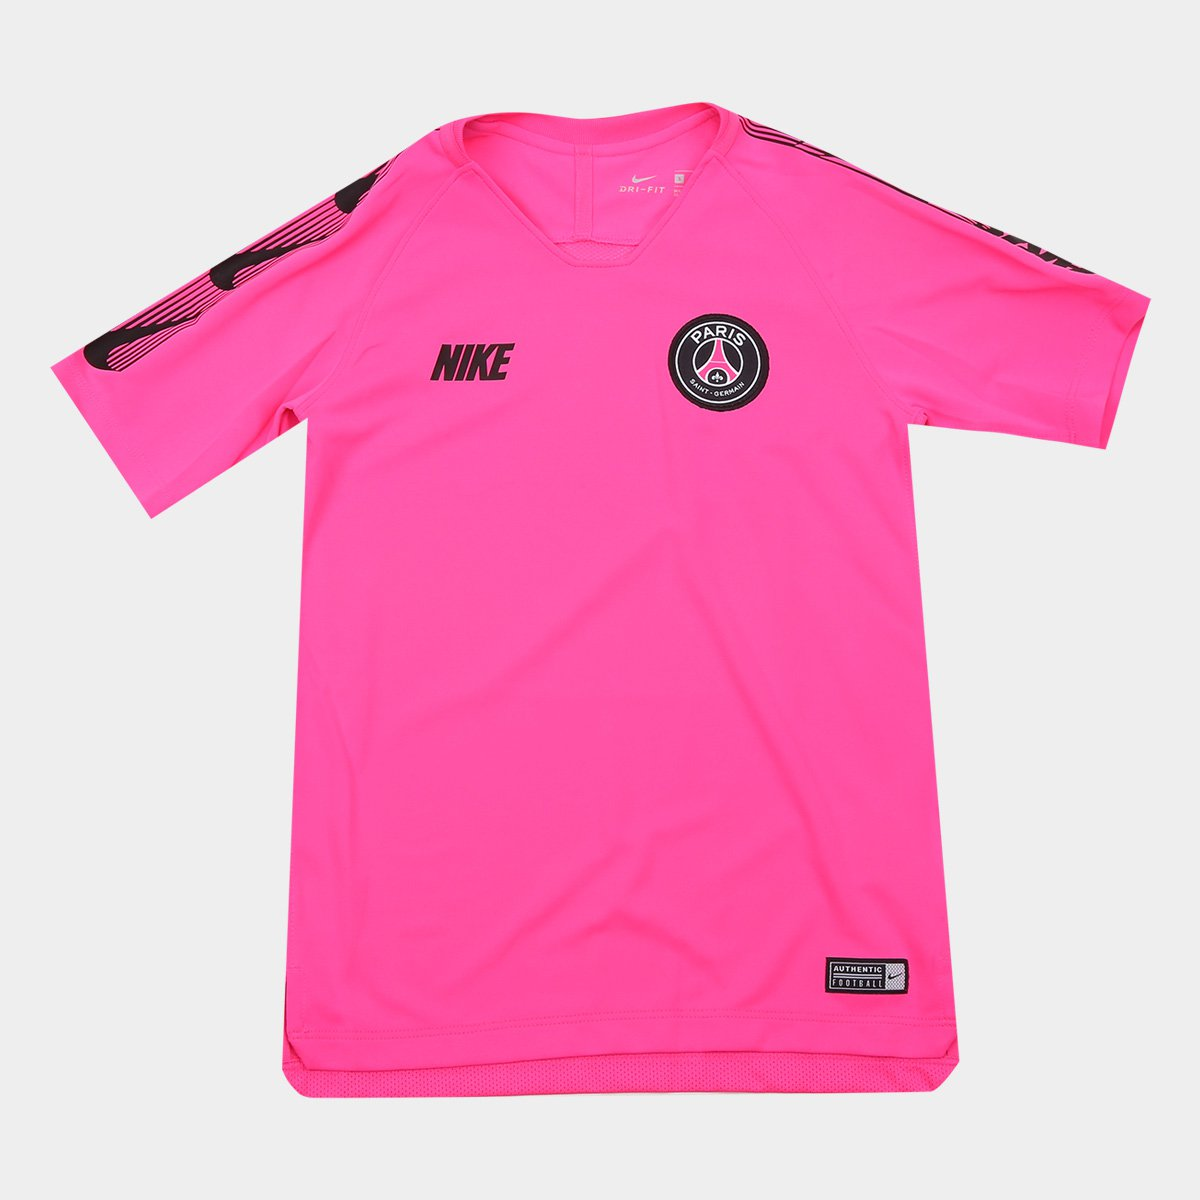 05f4b96b9a Camisa Paris Saint-Germain Infantil Treino 19/20 Nike - Pink e Preto |  Allianz Parque Shop